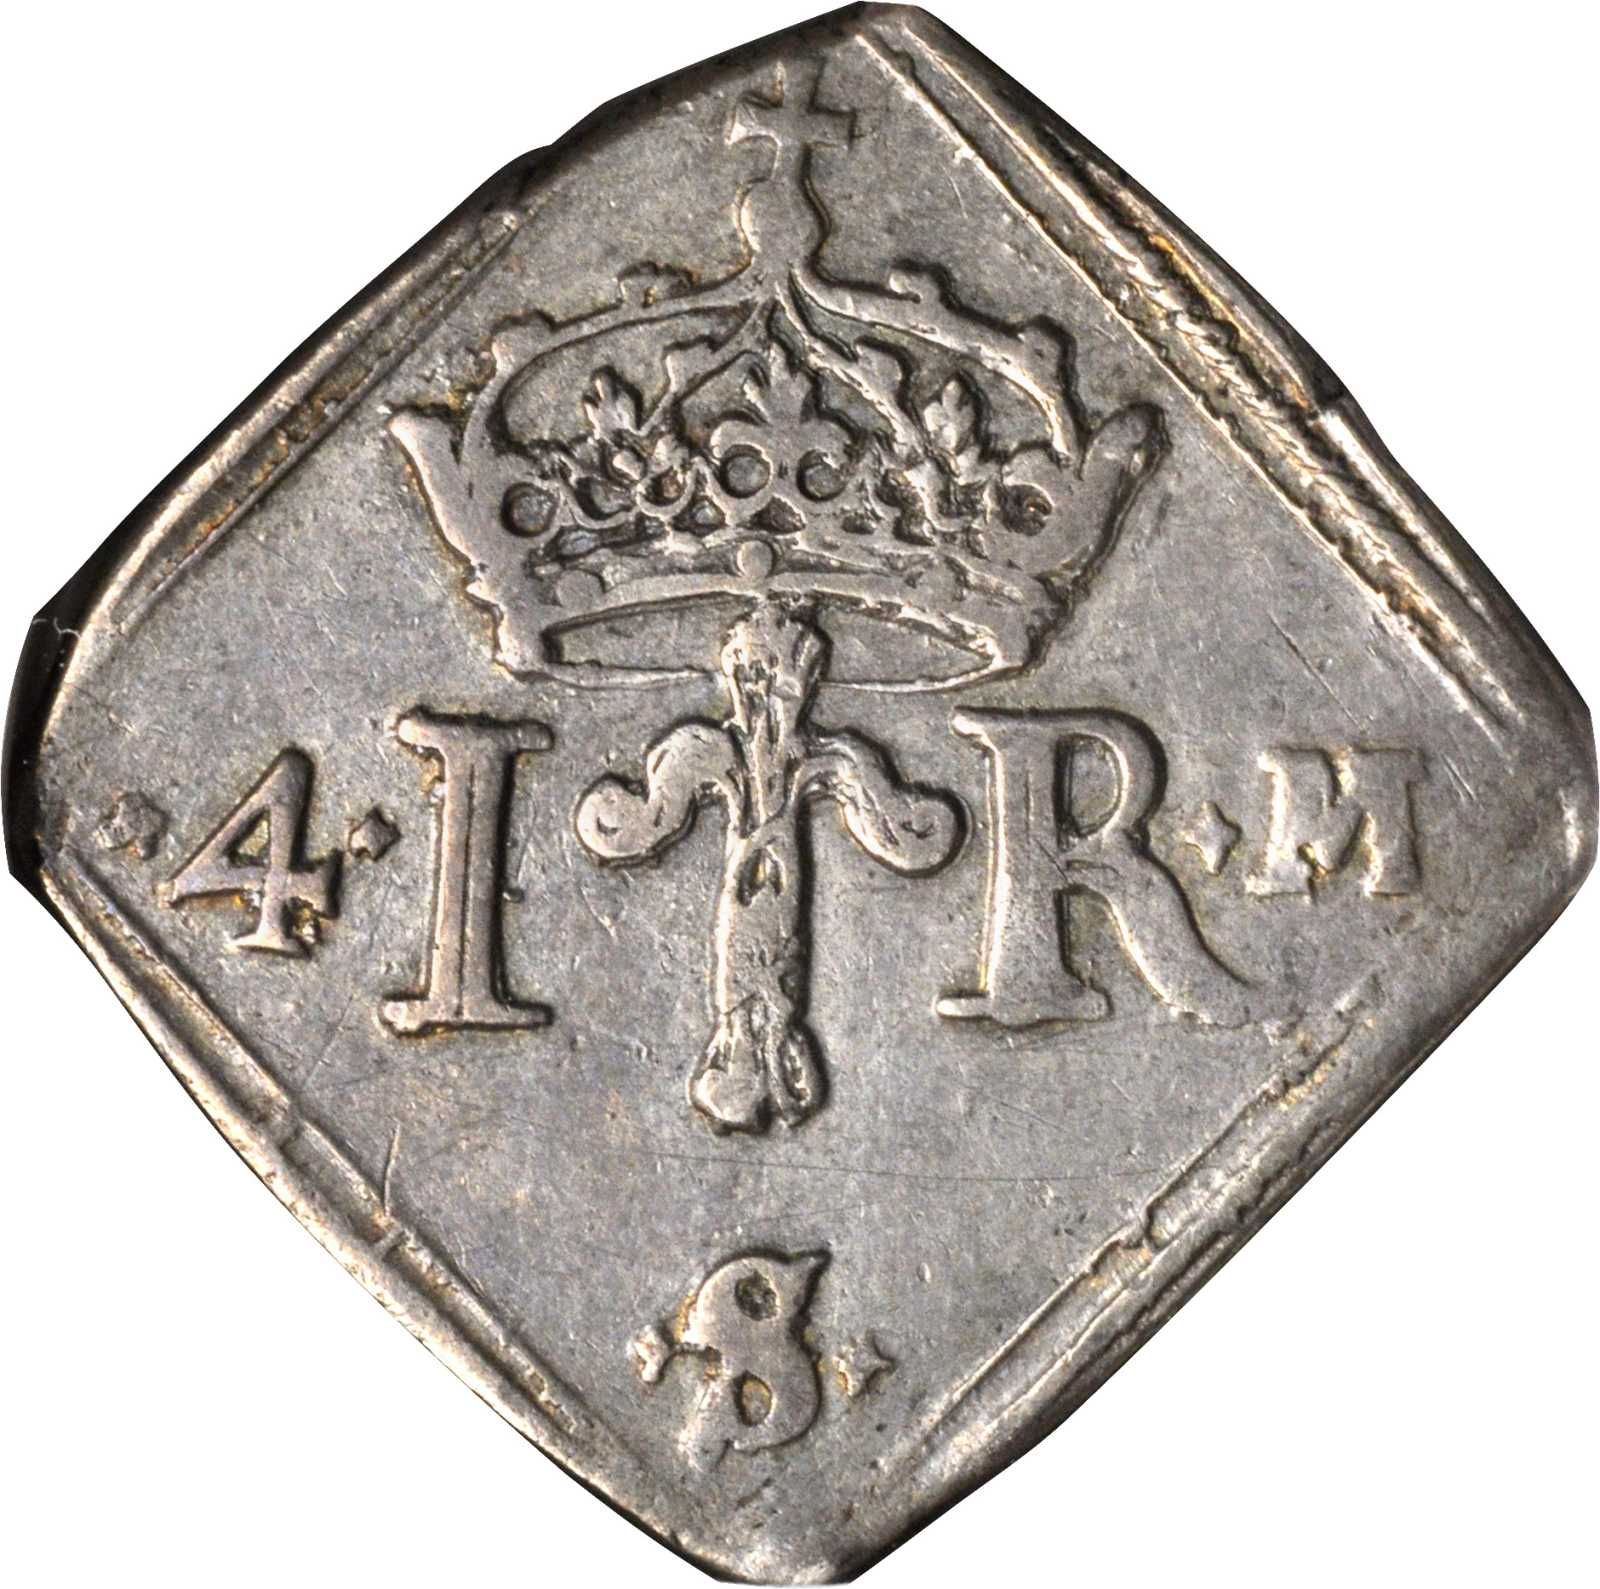 COIN, Sweden, Johan III (1568-92), 4 Mark Klippe, 1570